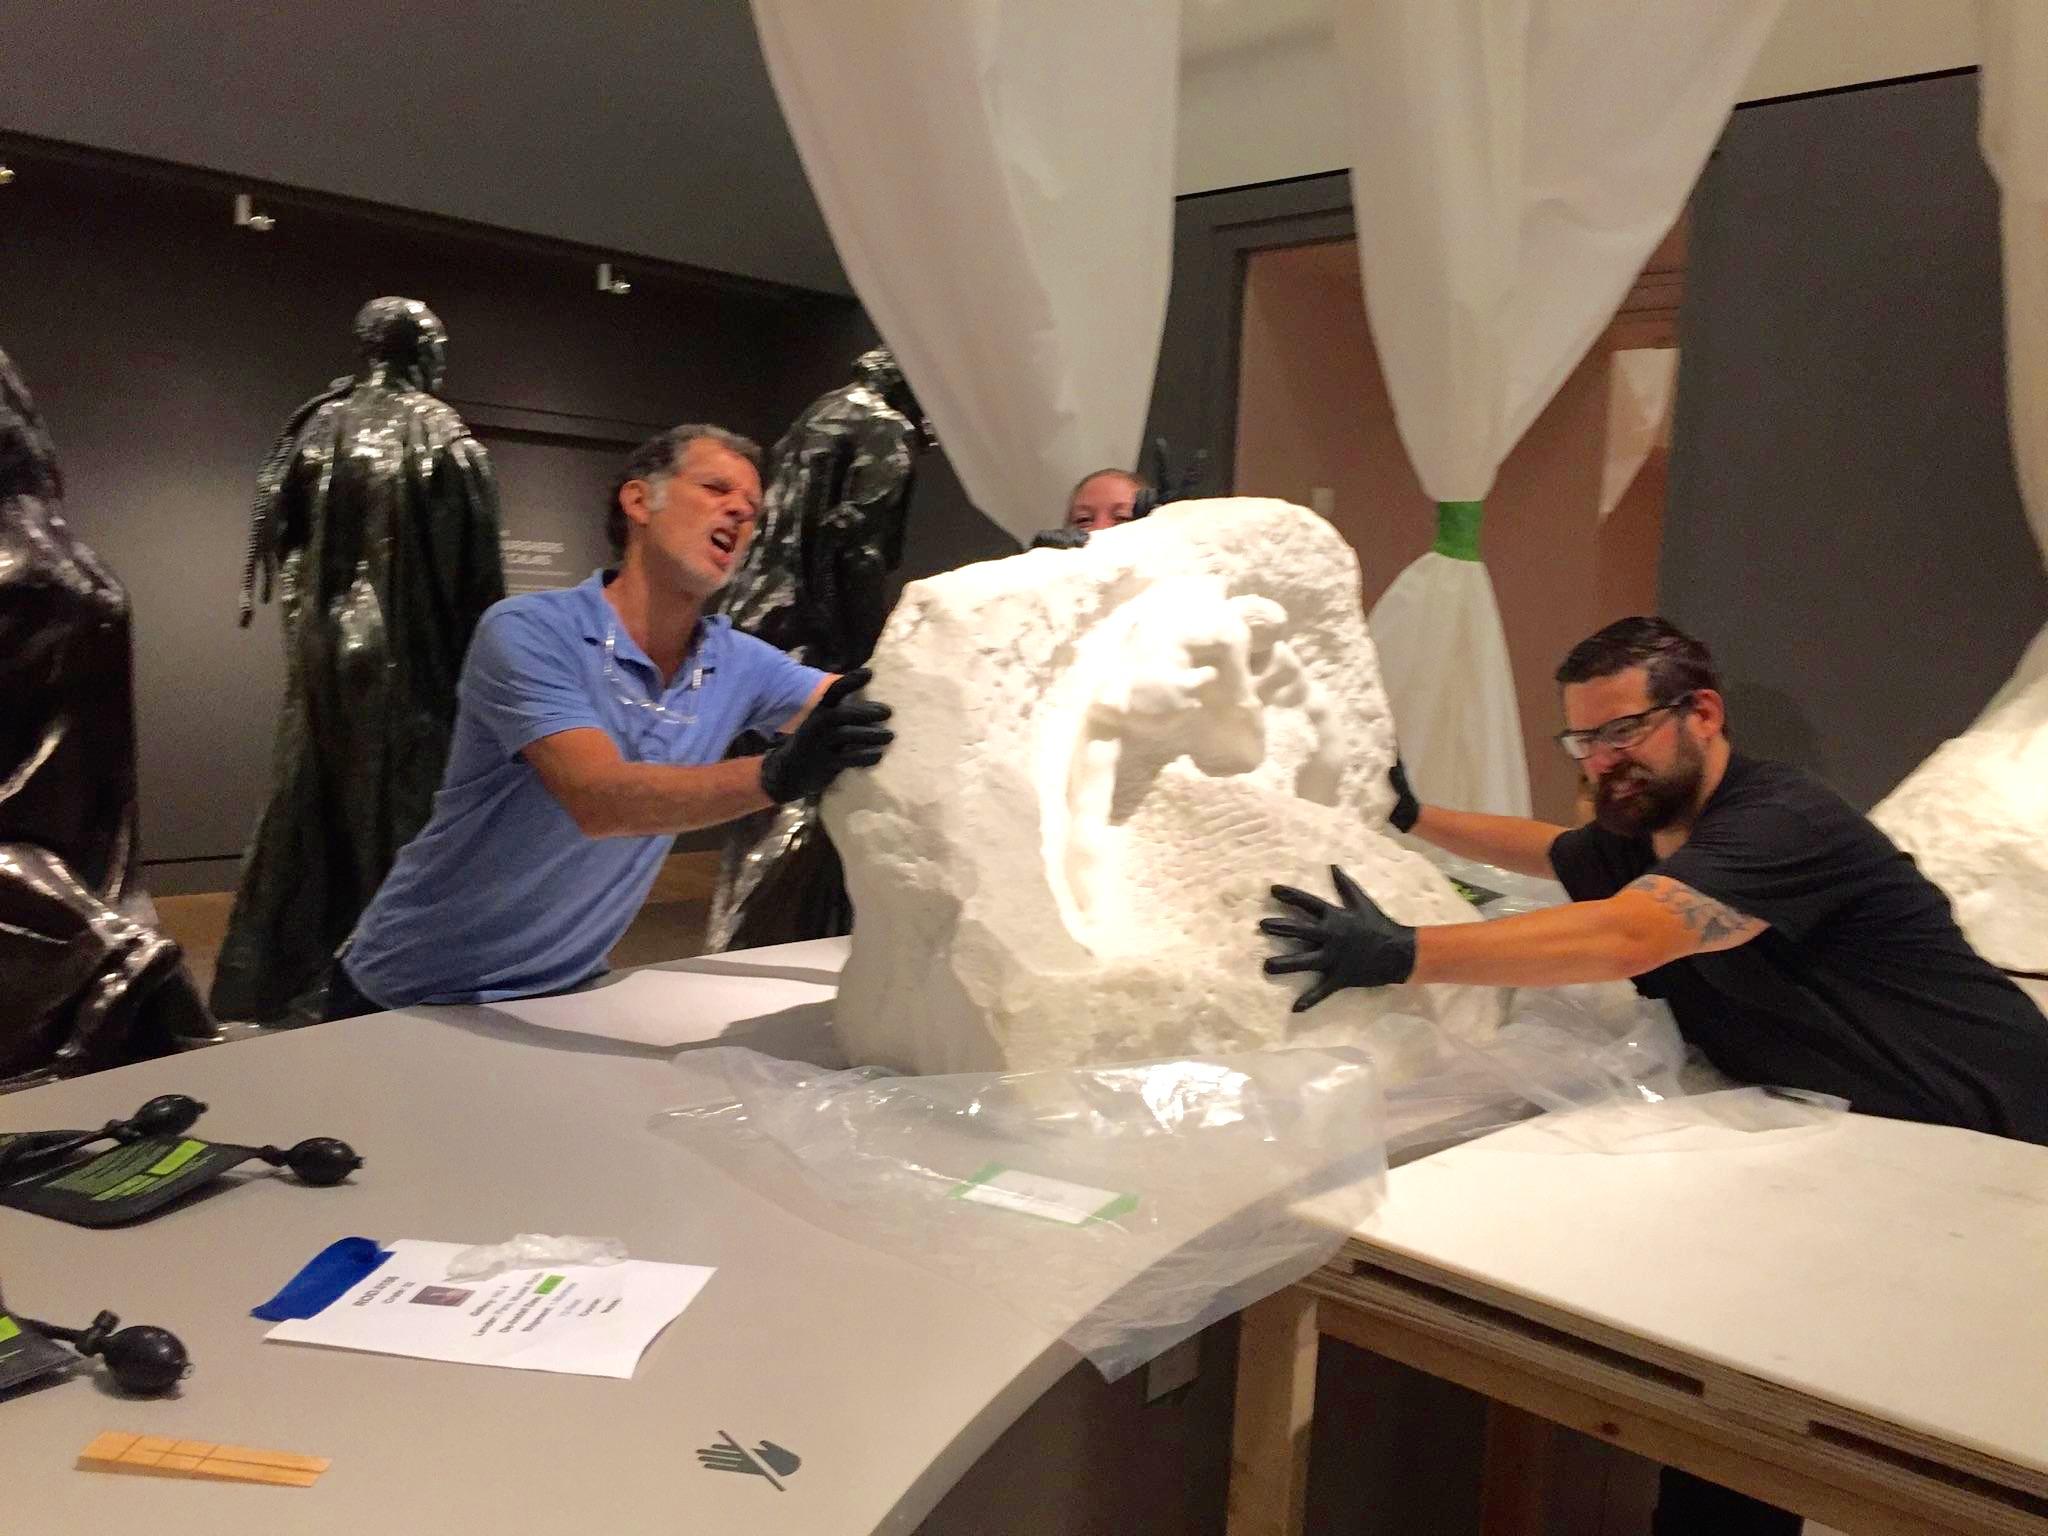 Rodin Exhibition De-Installation, PEM